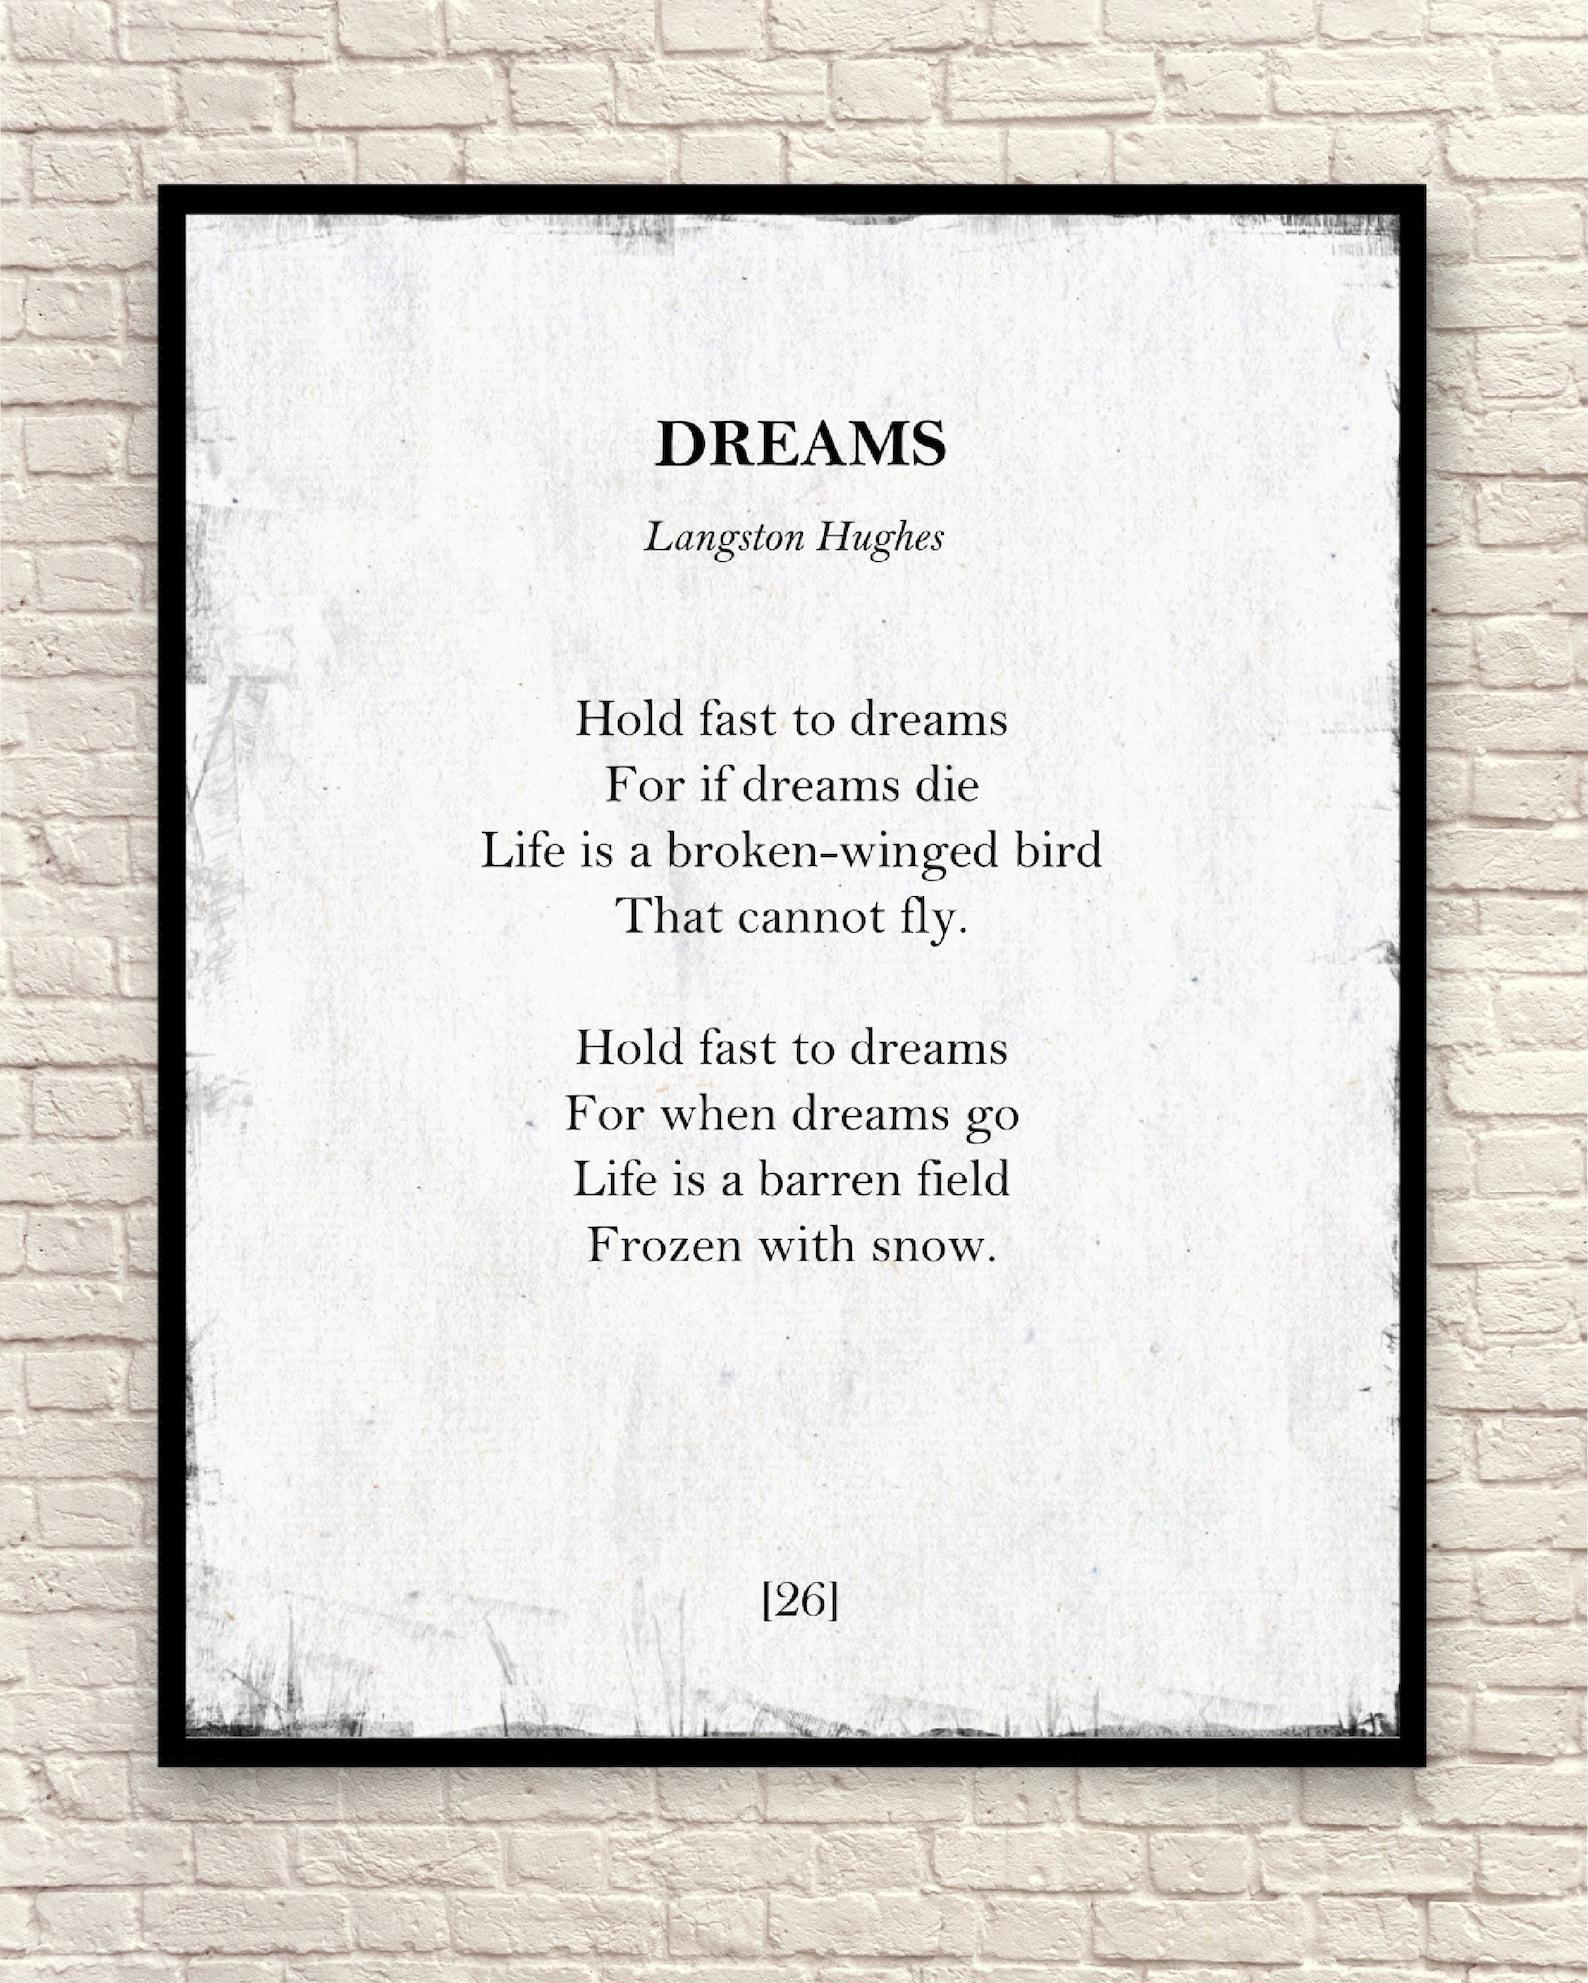 langston hughes poems - HD1588×1983